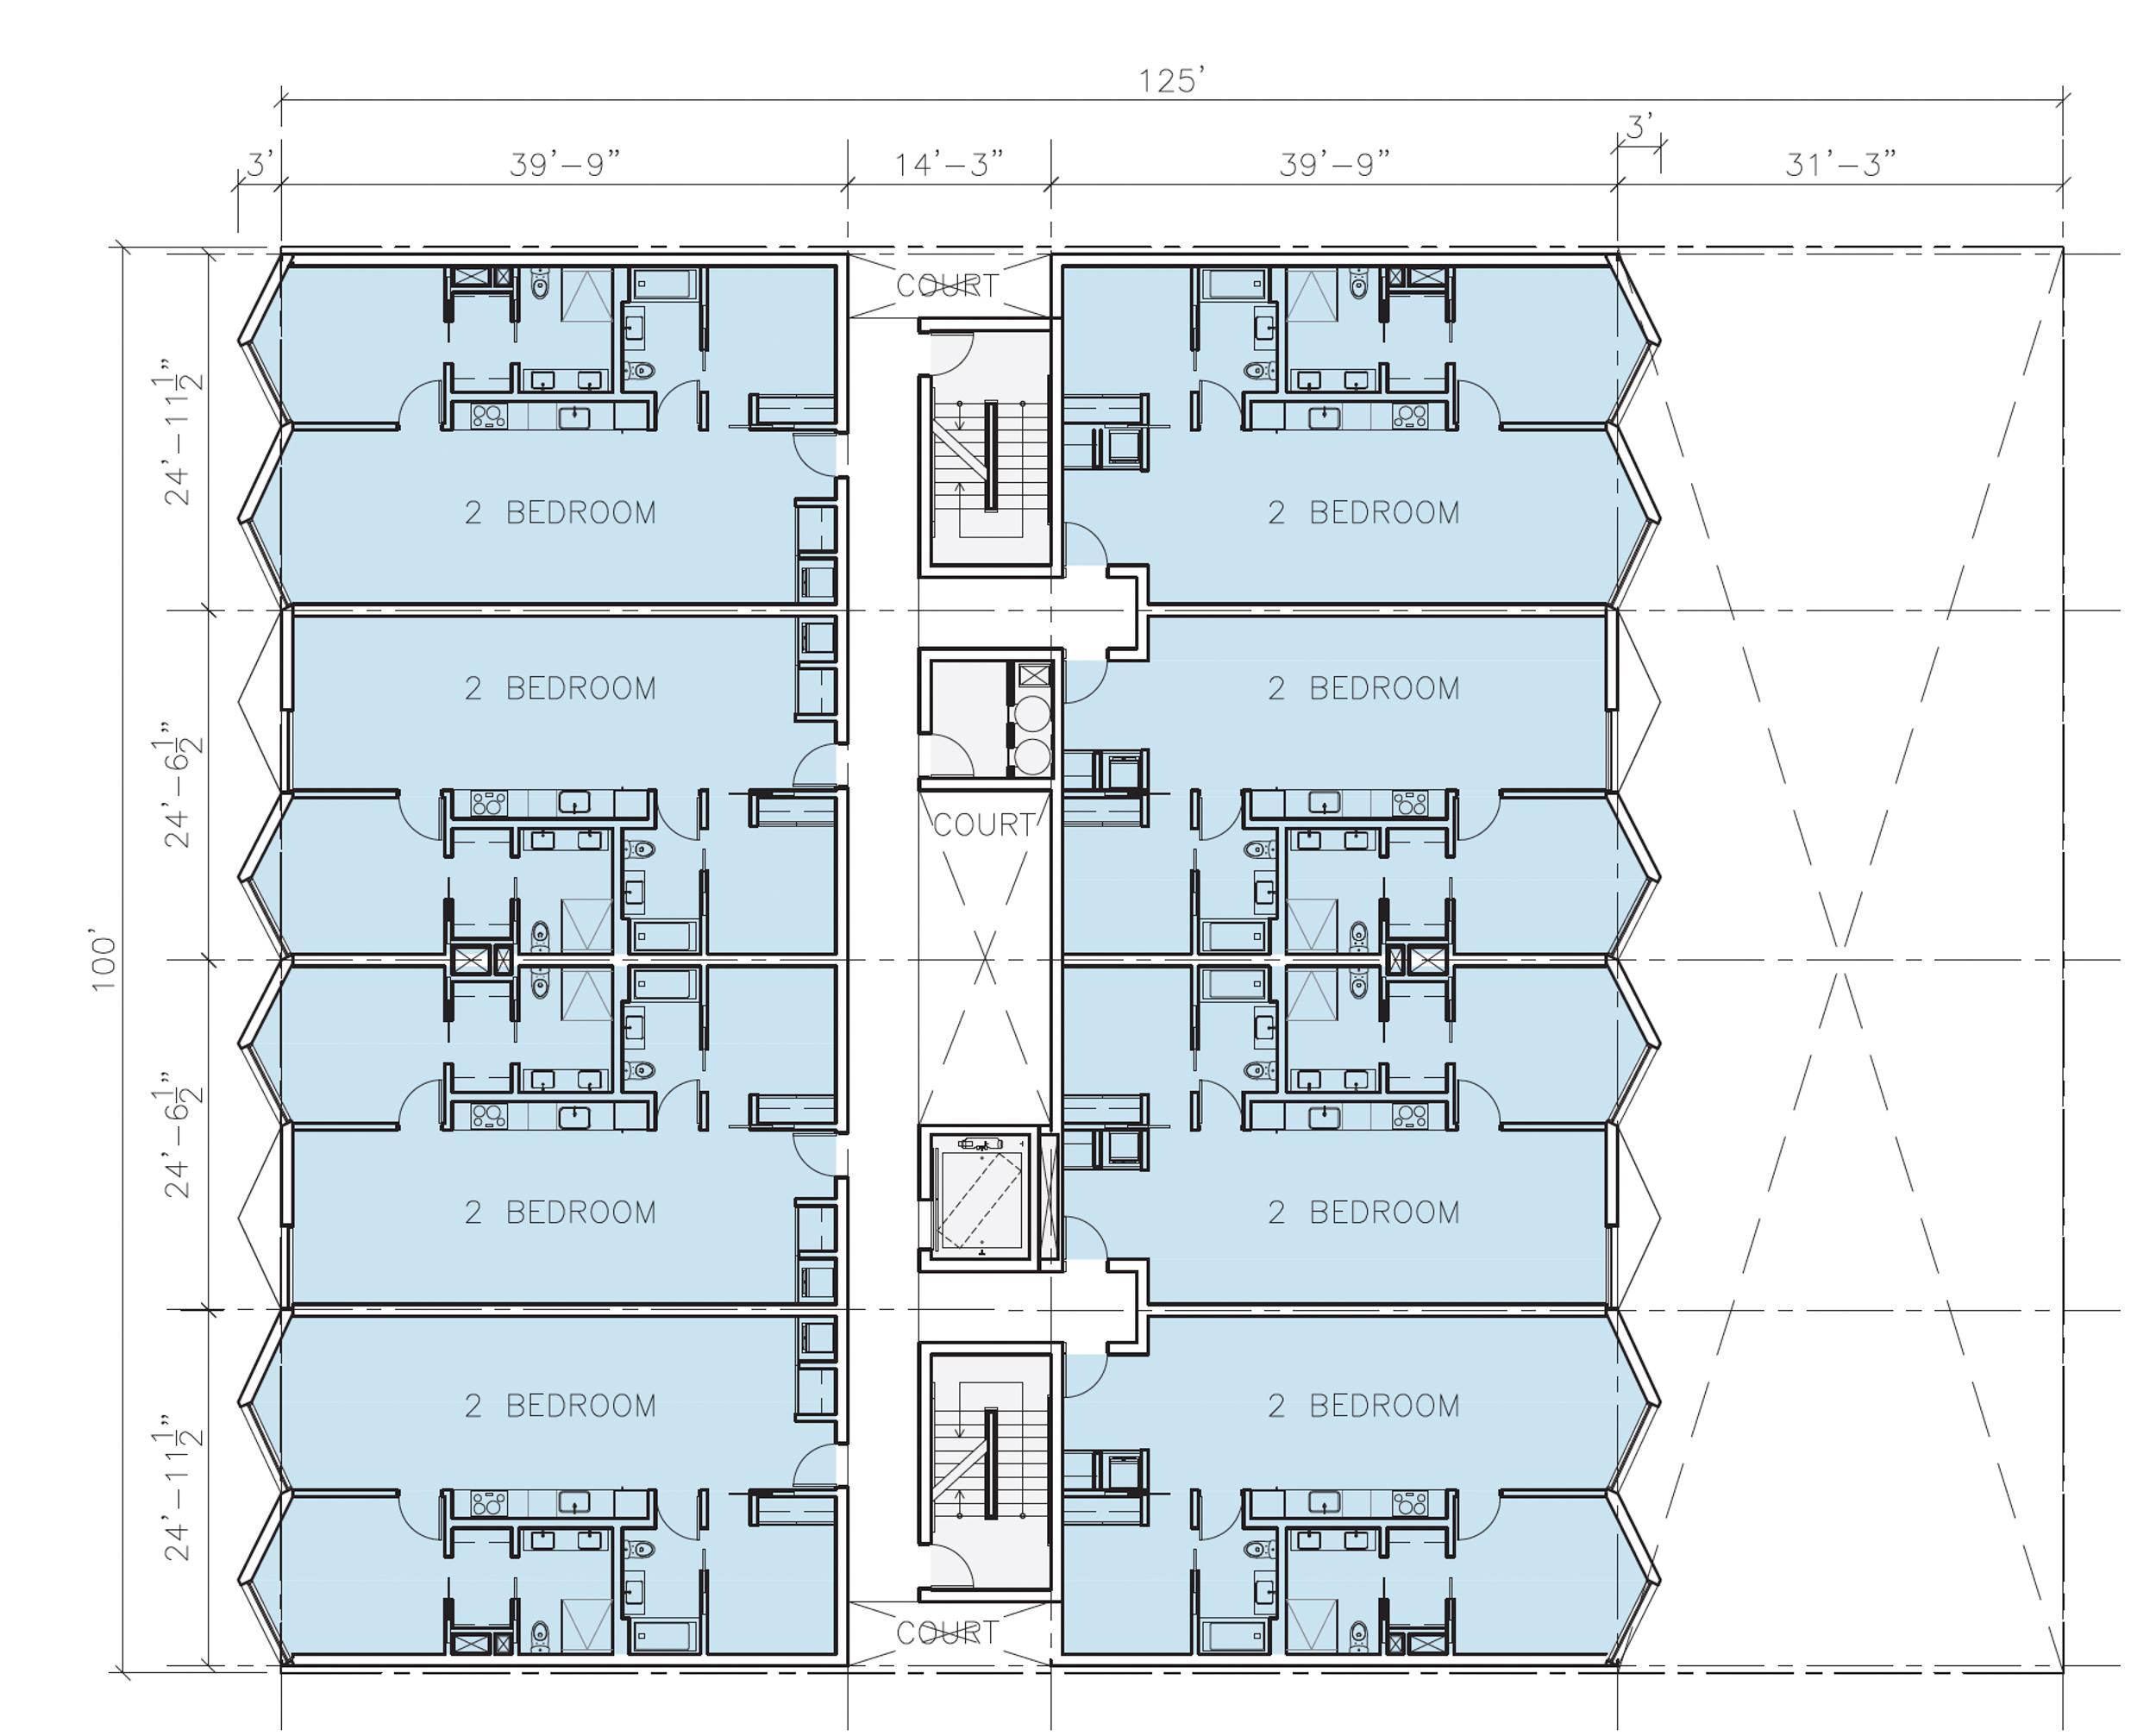 67-69 Belcher Street second-level floor plan, illustration by Stanley Saitowitz | Natoma Architects